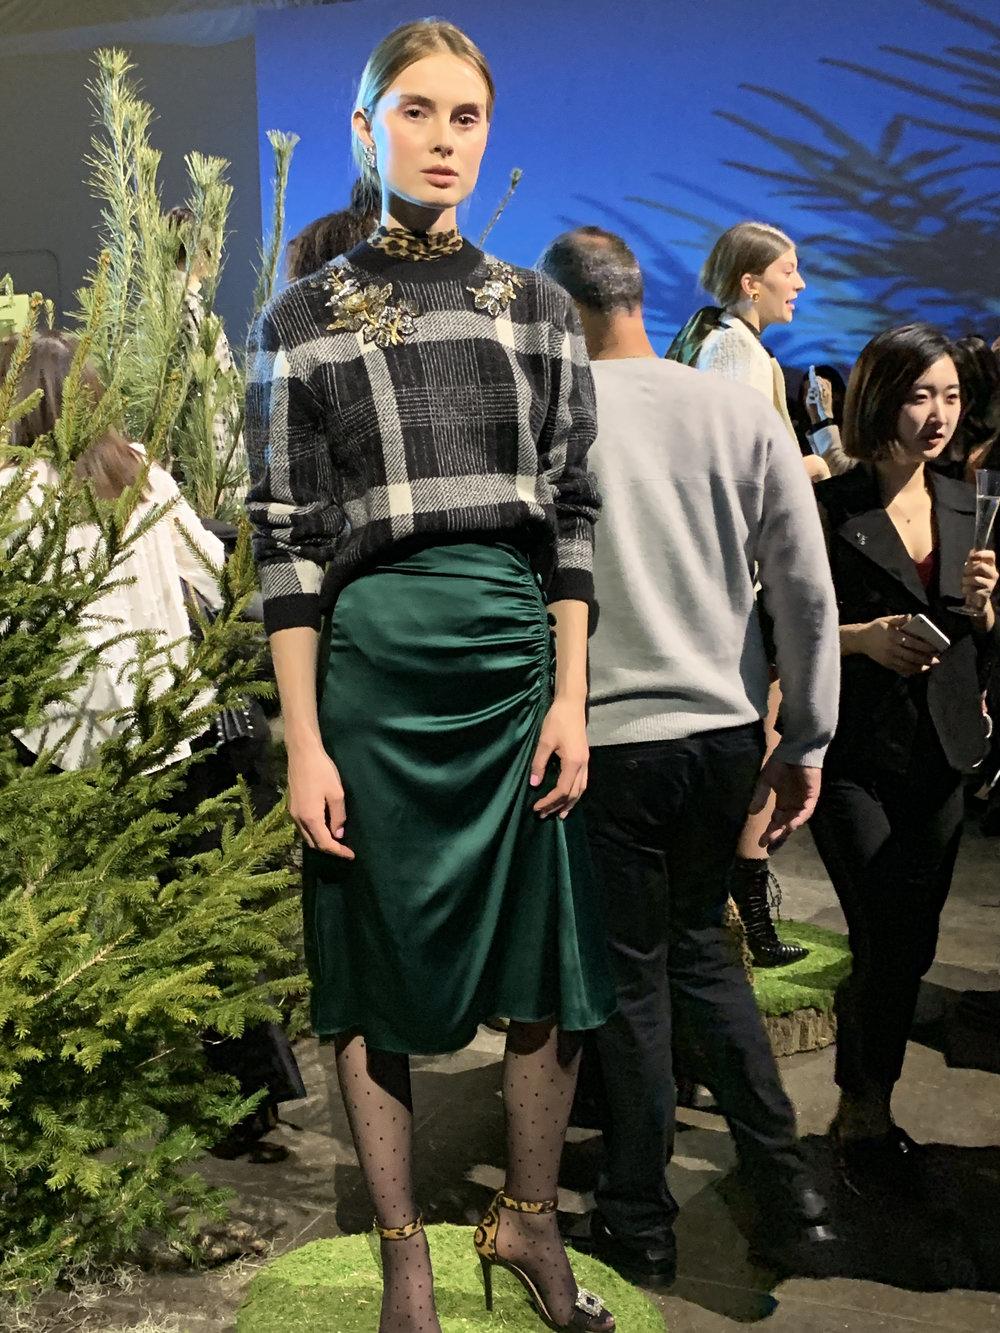 Model is wearing: Leopard KANU Top, Plaid DEANA Sweater, Green MINETTA Skirt, Leopard/Black ROAN Sandals